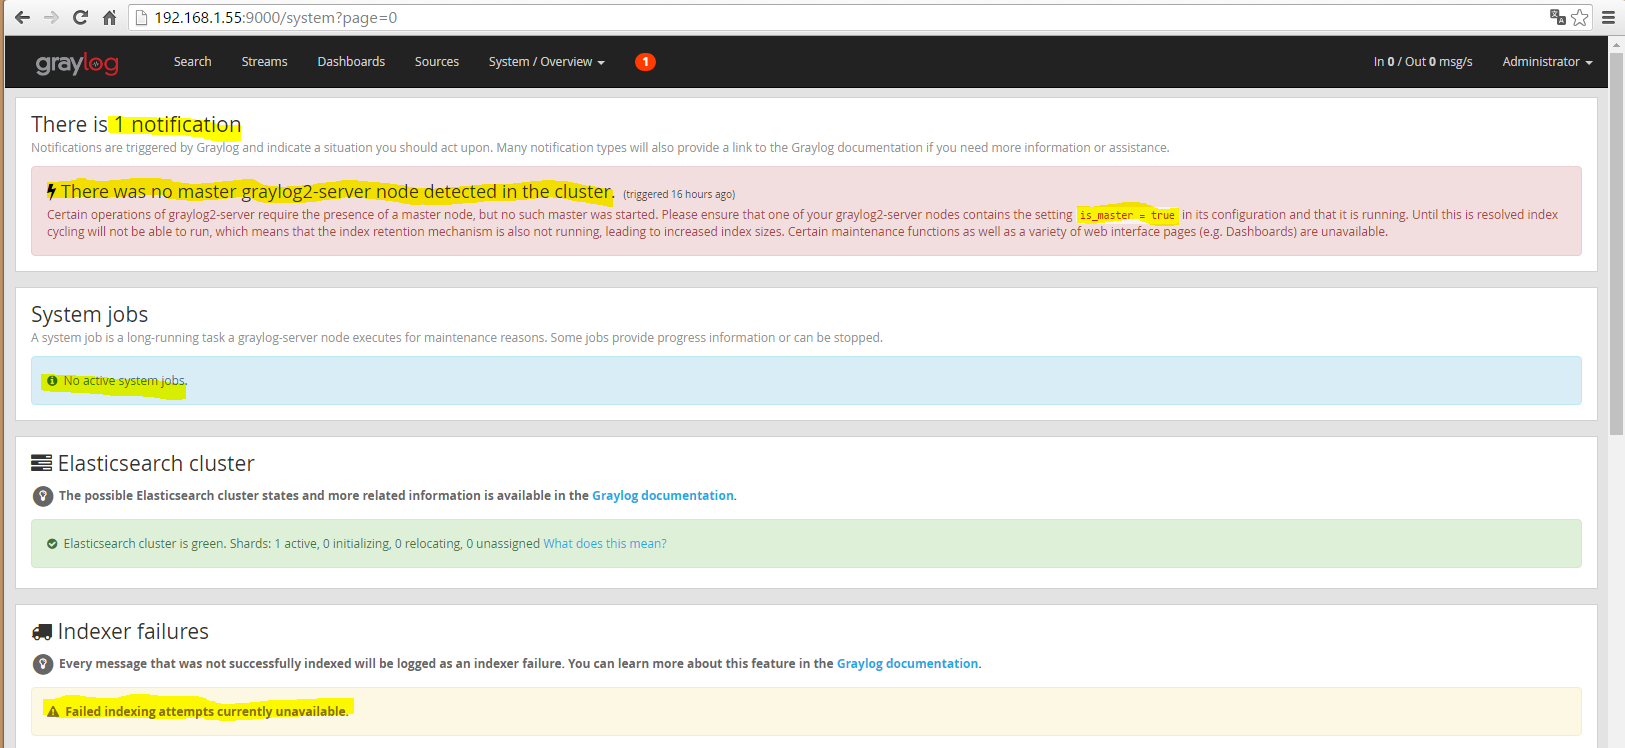 Installation 48 Mise en état false du Master node pour vérifier l'incidence sur Graylog